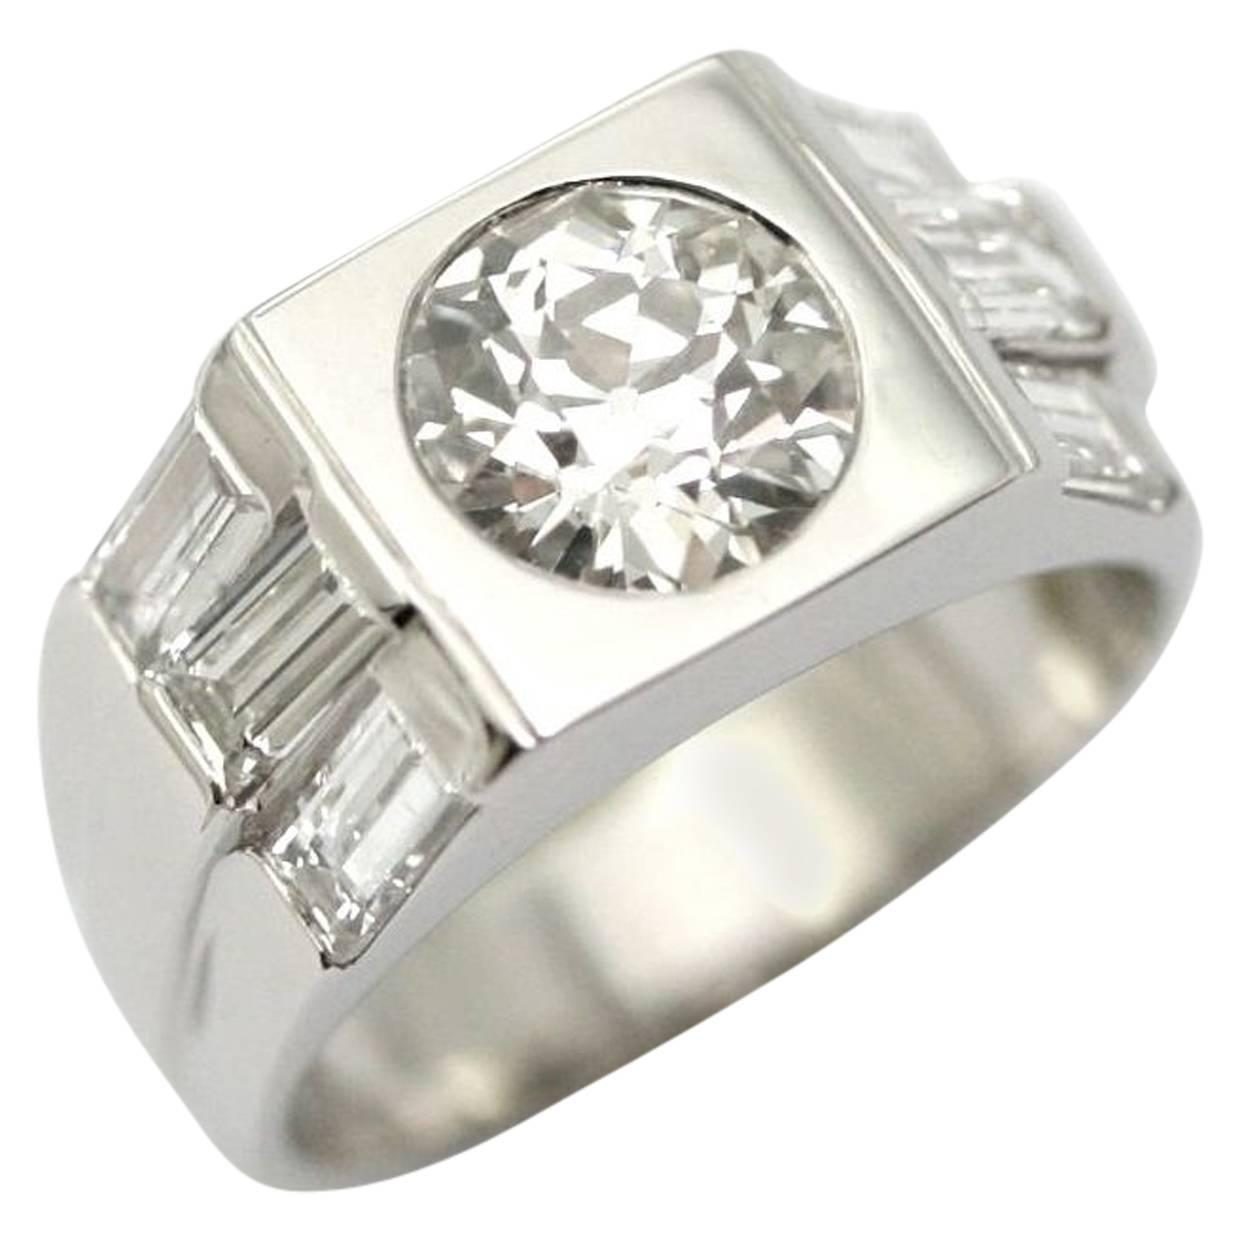 1930s 1 57 carat platinum signet band ring